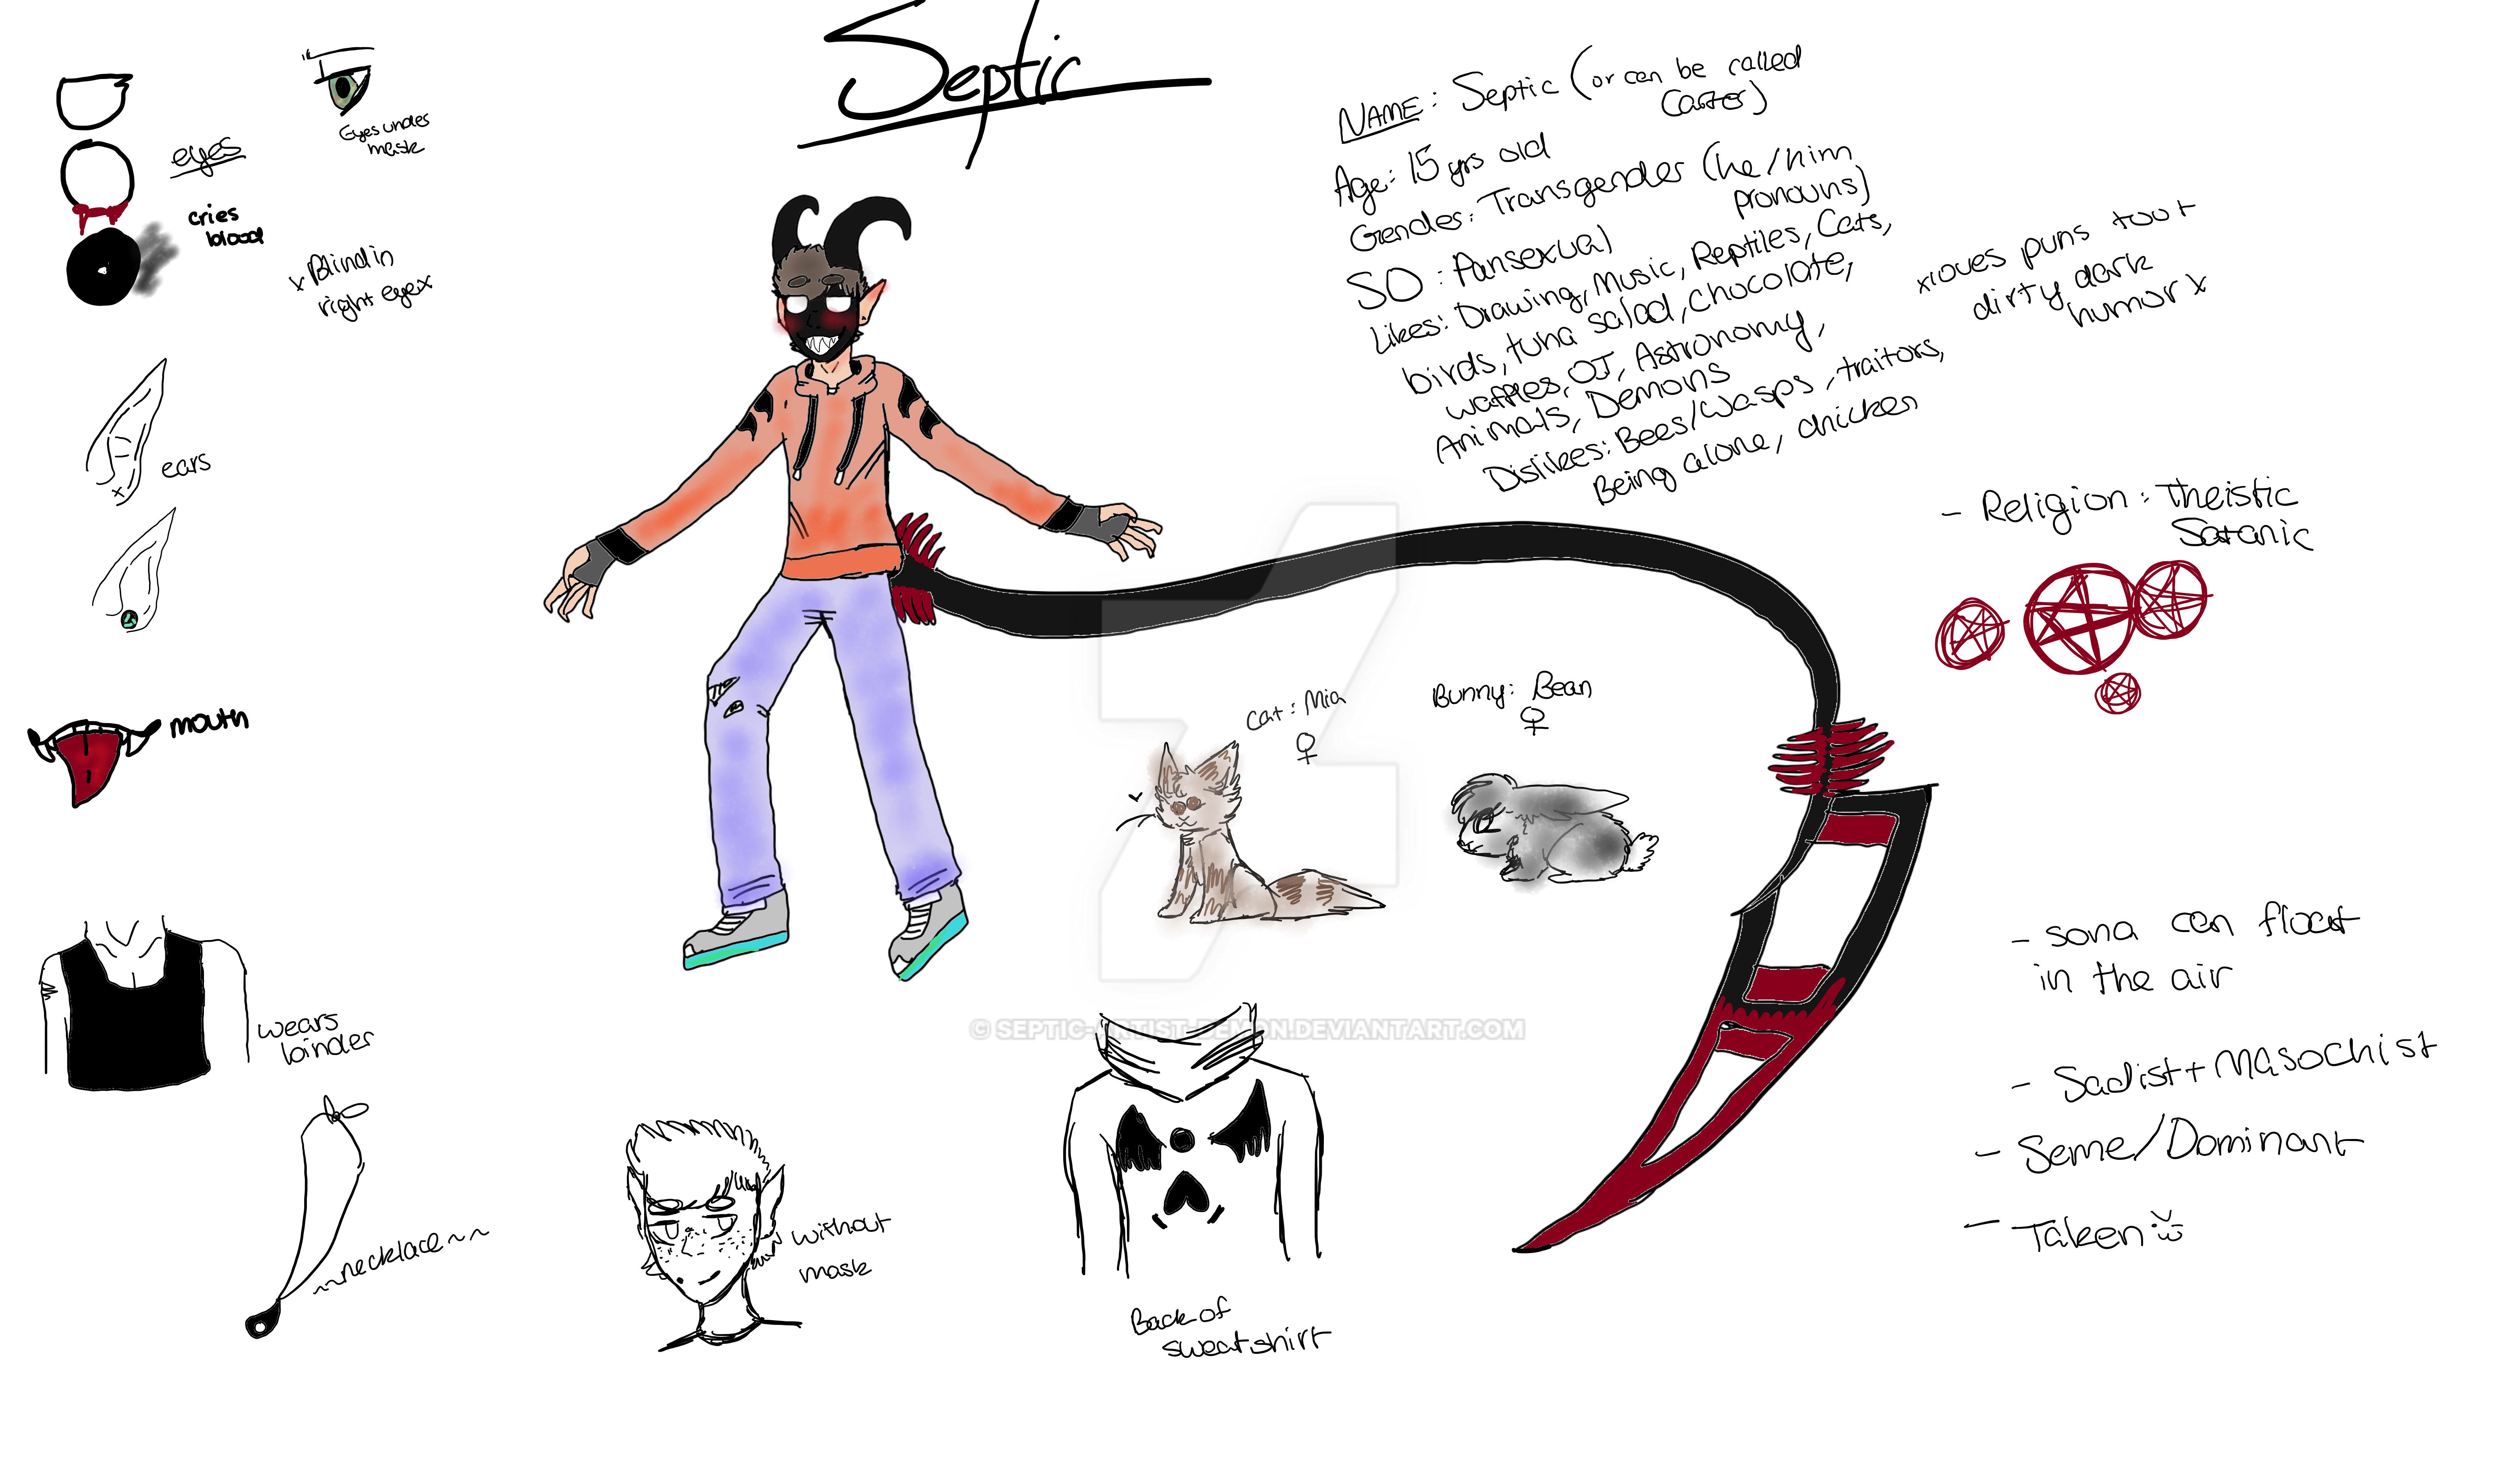 Septic ref update by Septic-Artist-Demon on DeviantArt